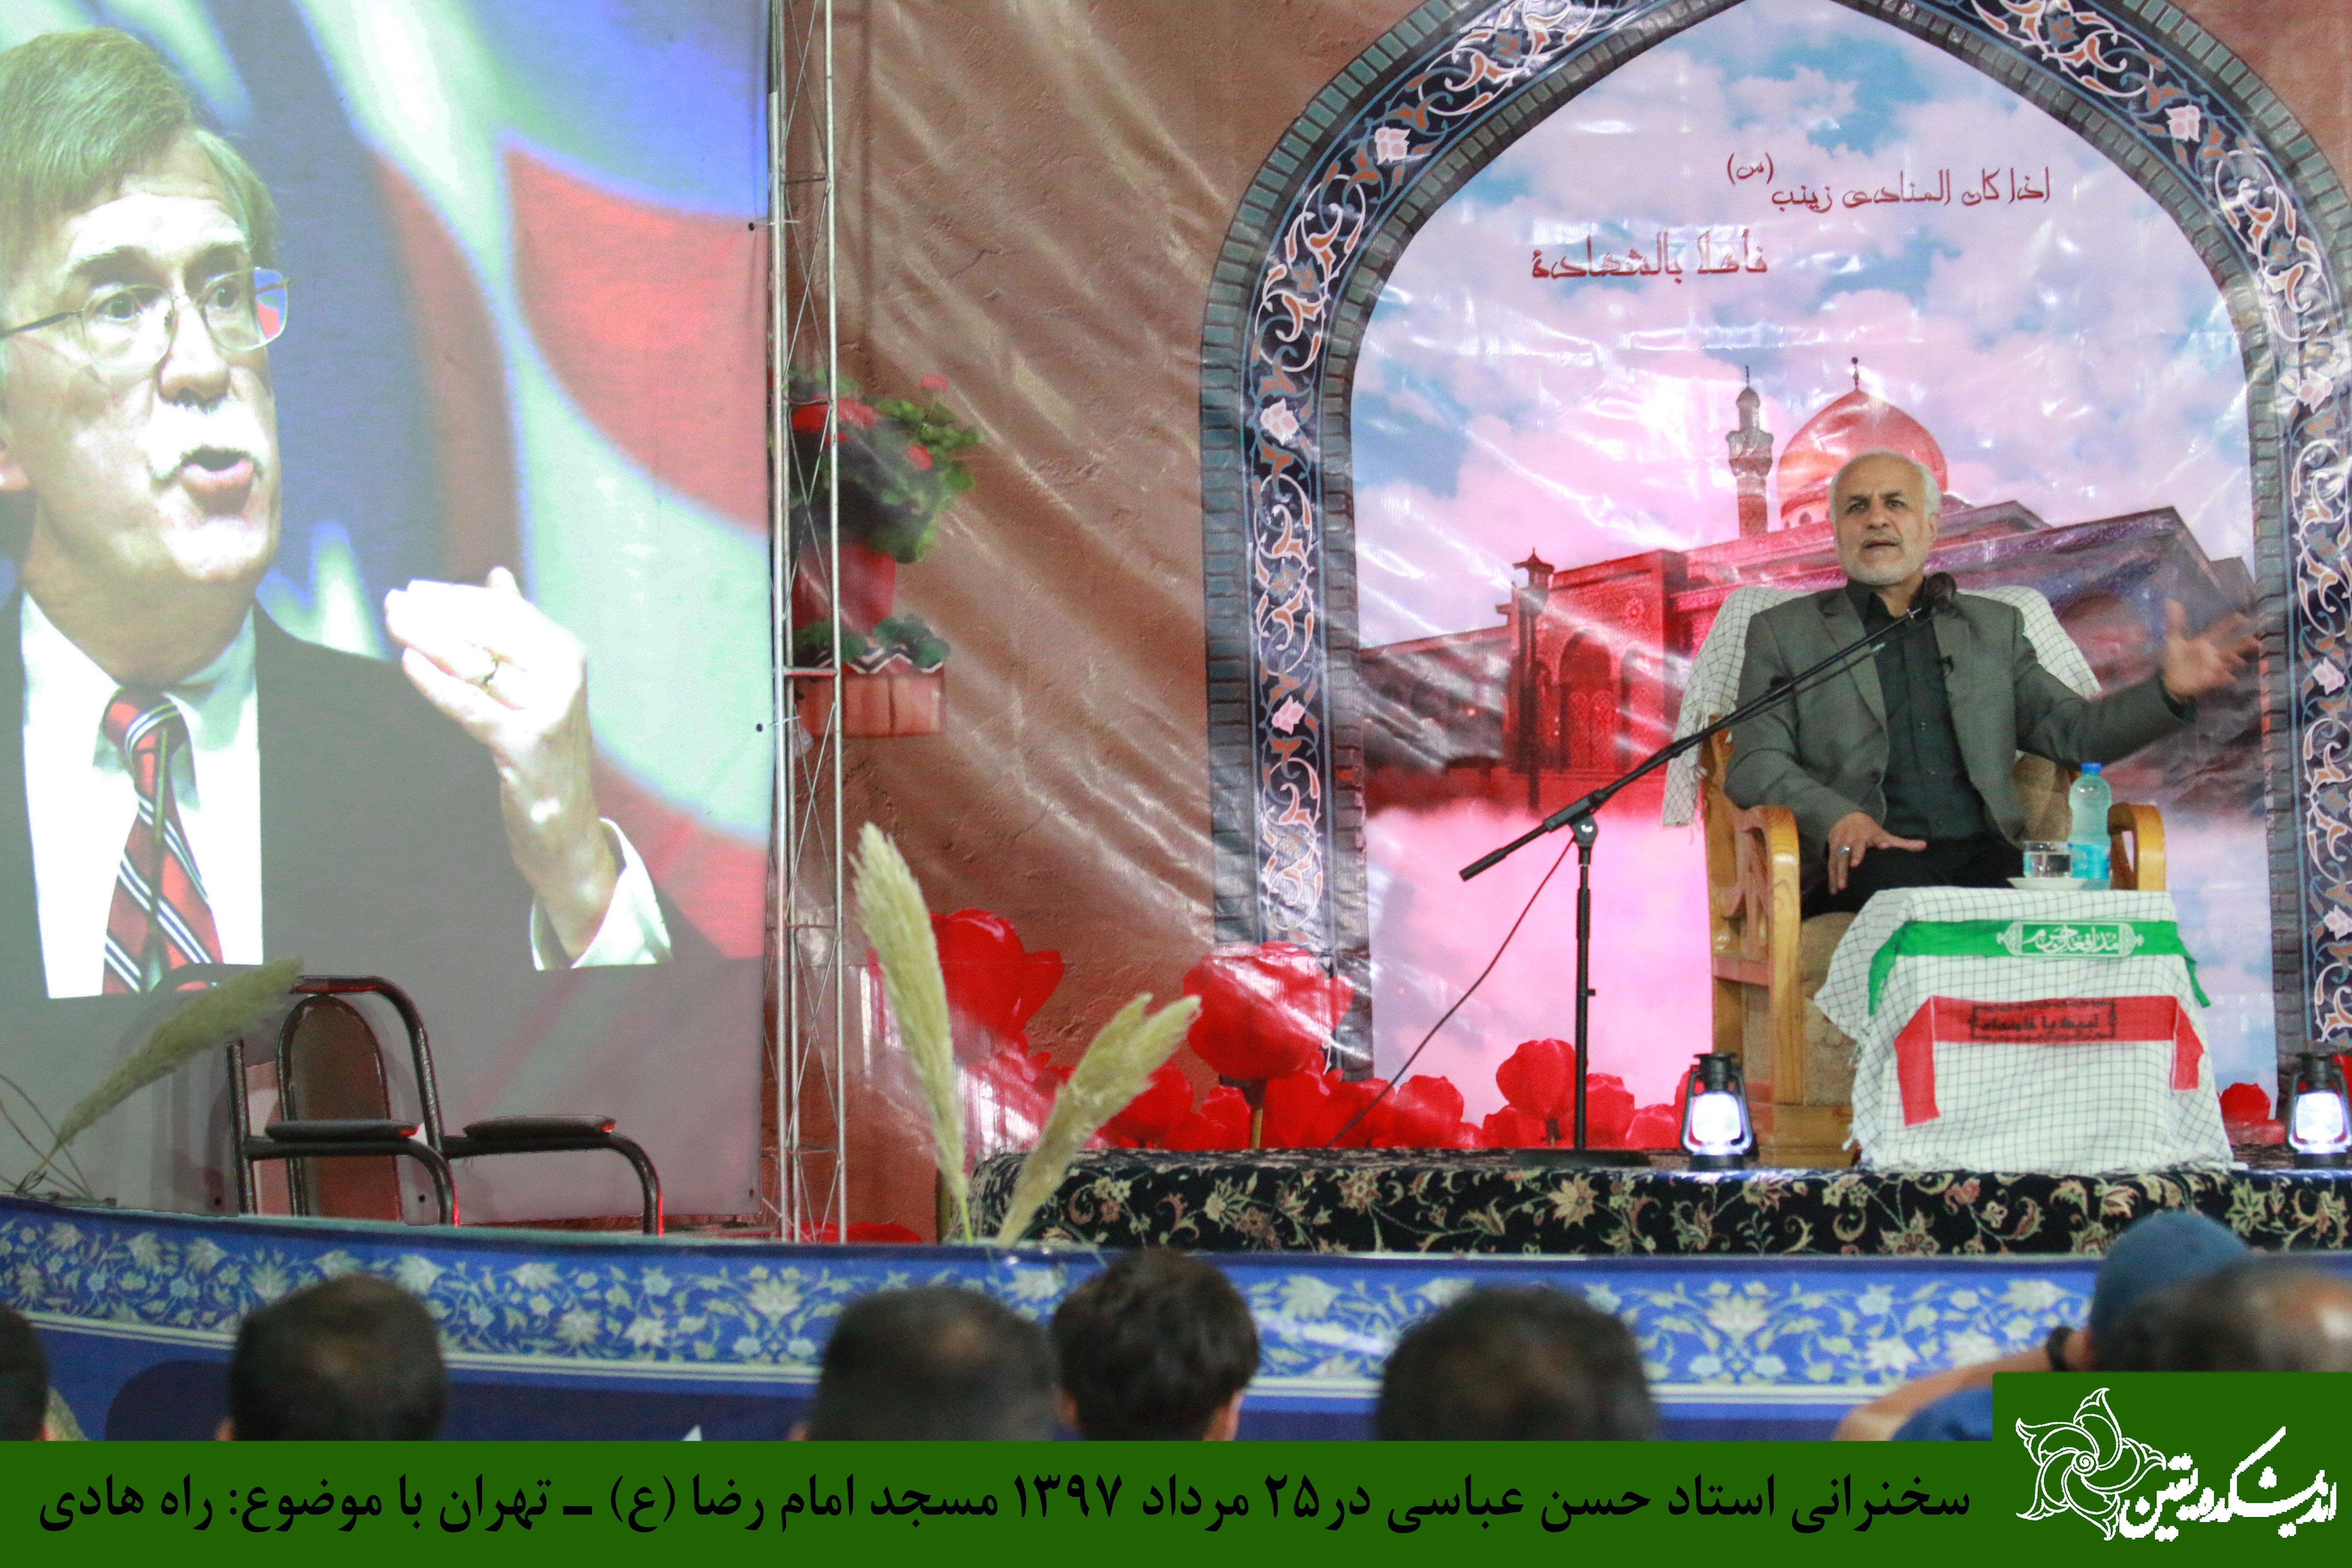 IMG 970525%20%285%29 نقل از تصویری؛ سخنرانی استاد حسن عباسی با موضوع راه هادی